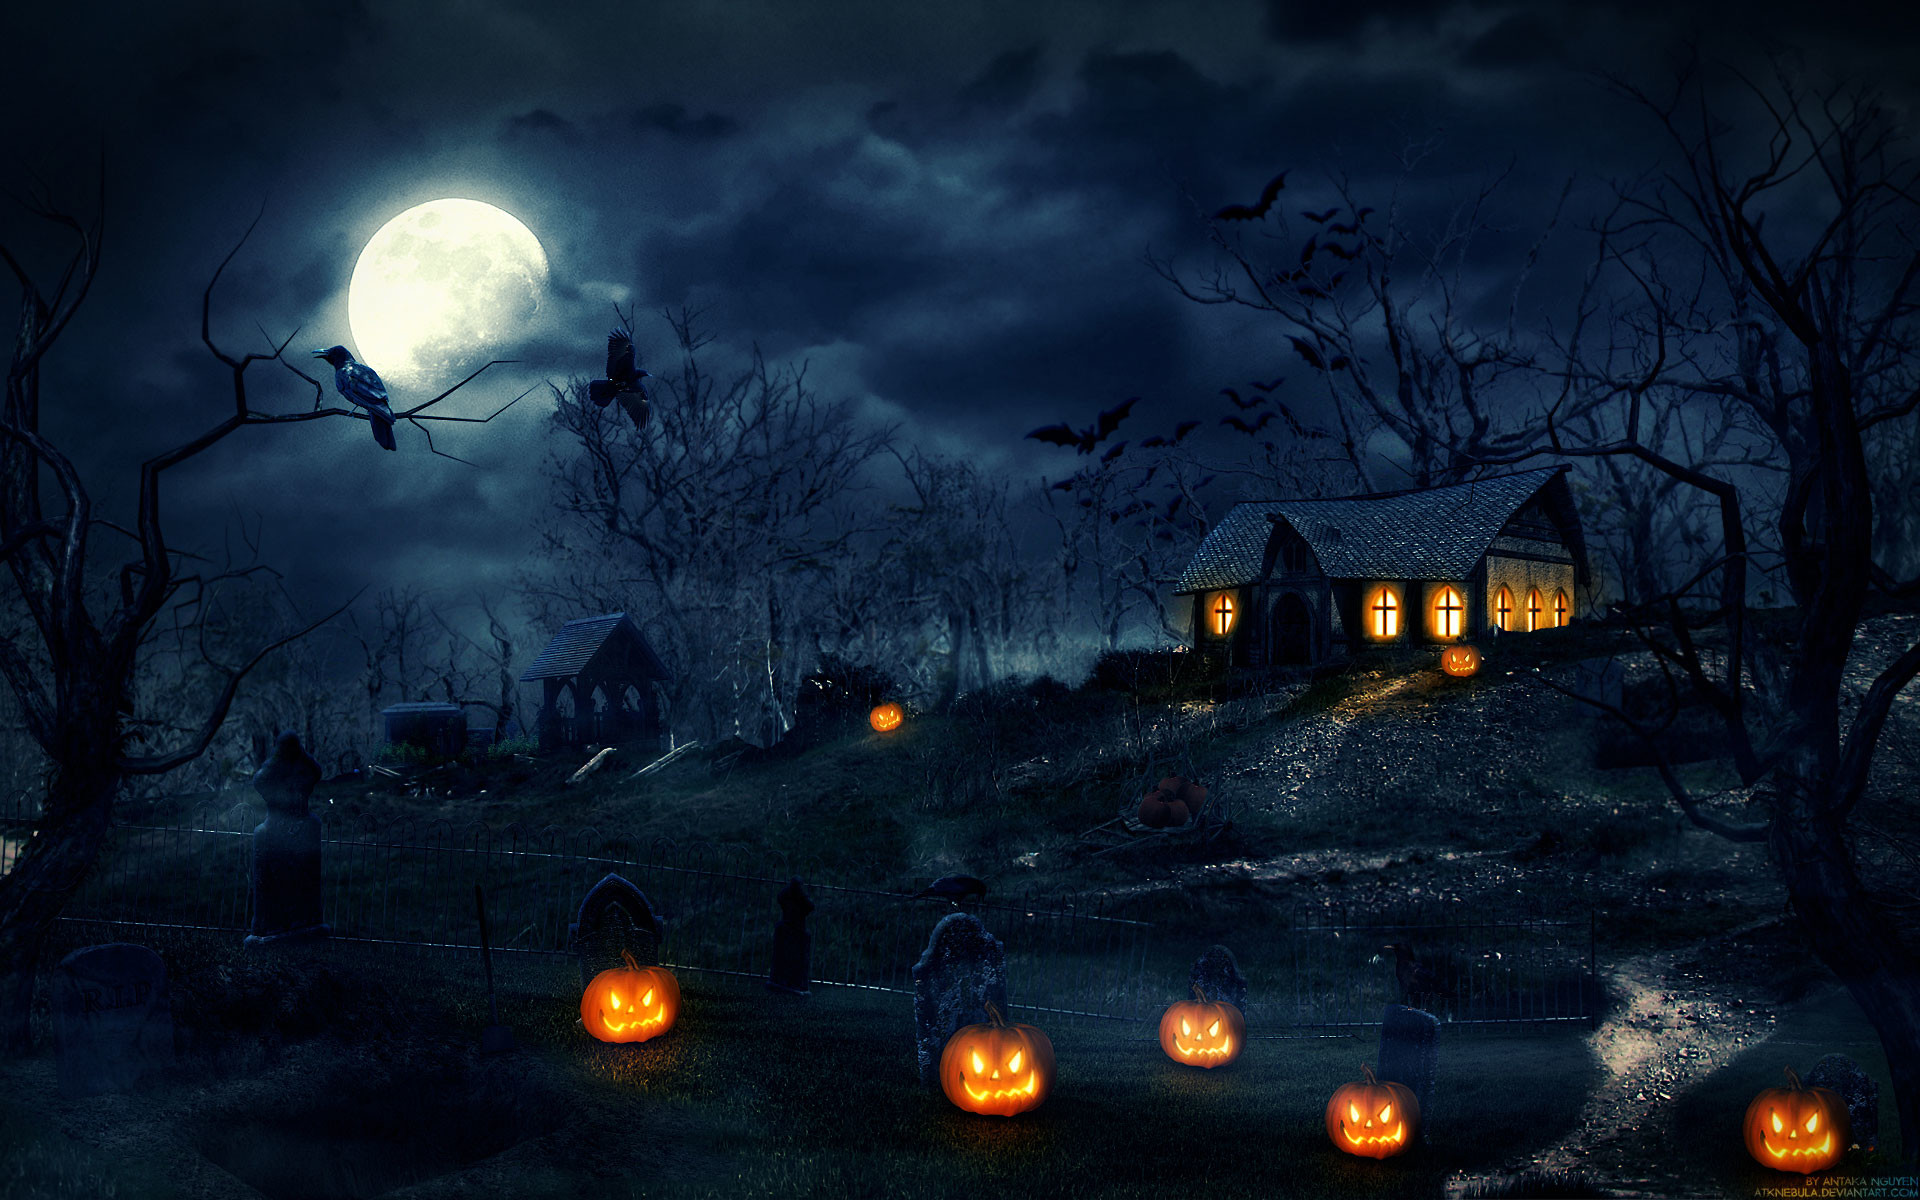 2014 Halloween Night Wallpaper HD